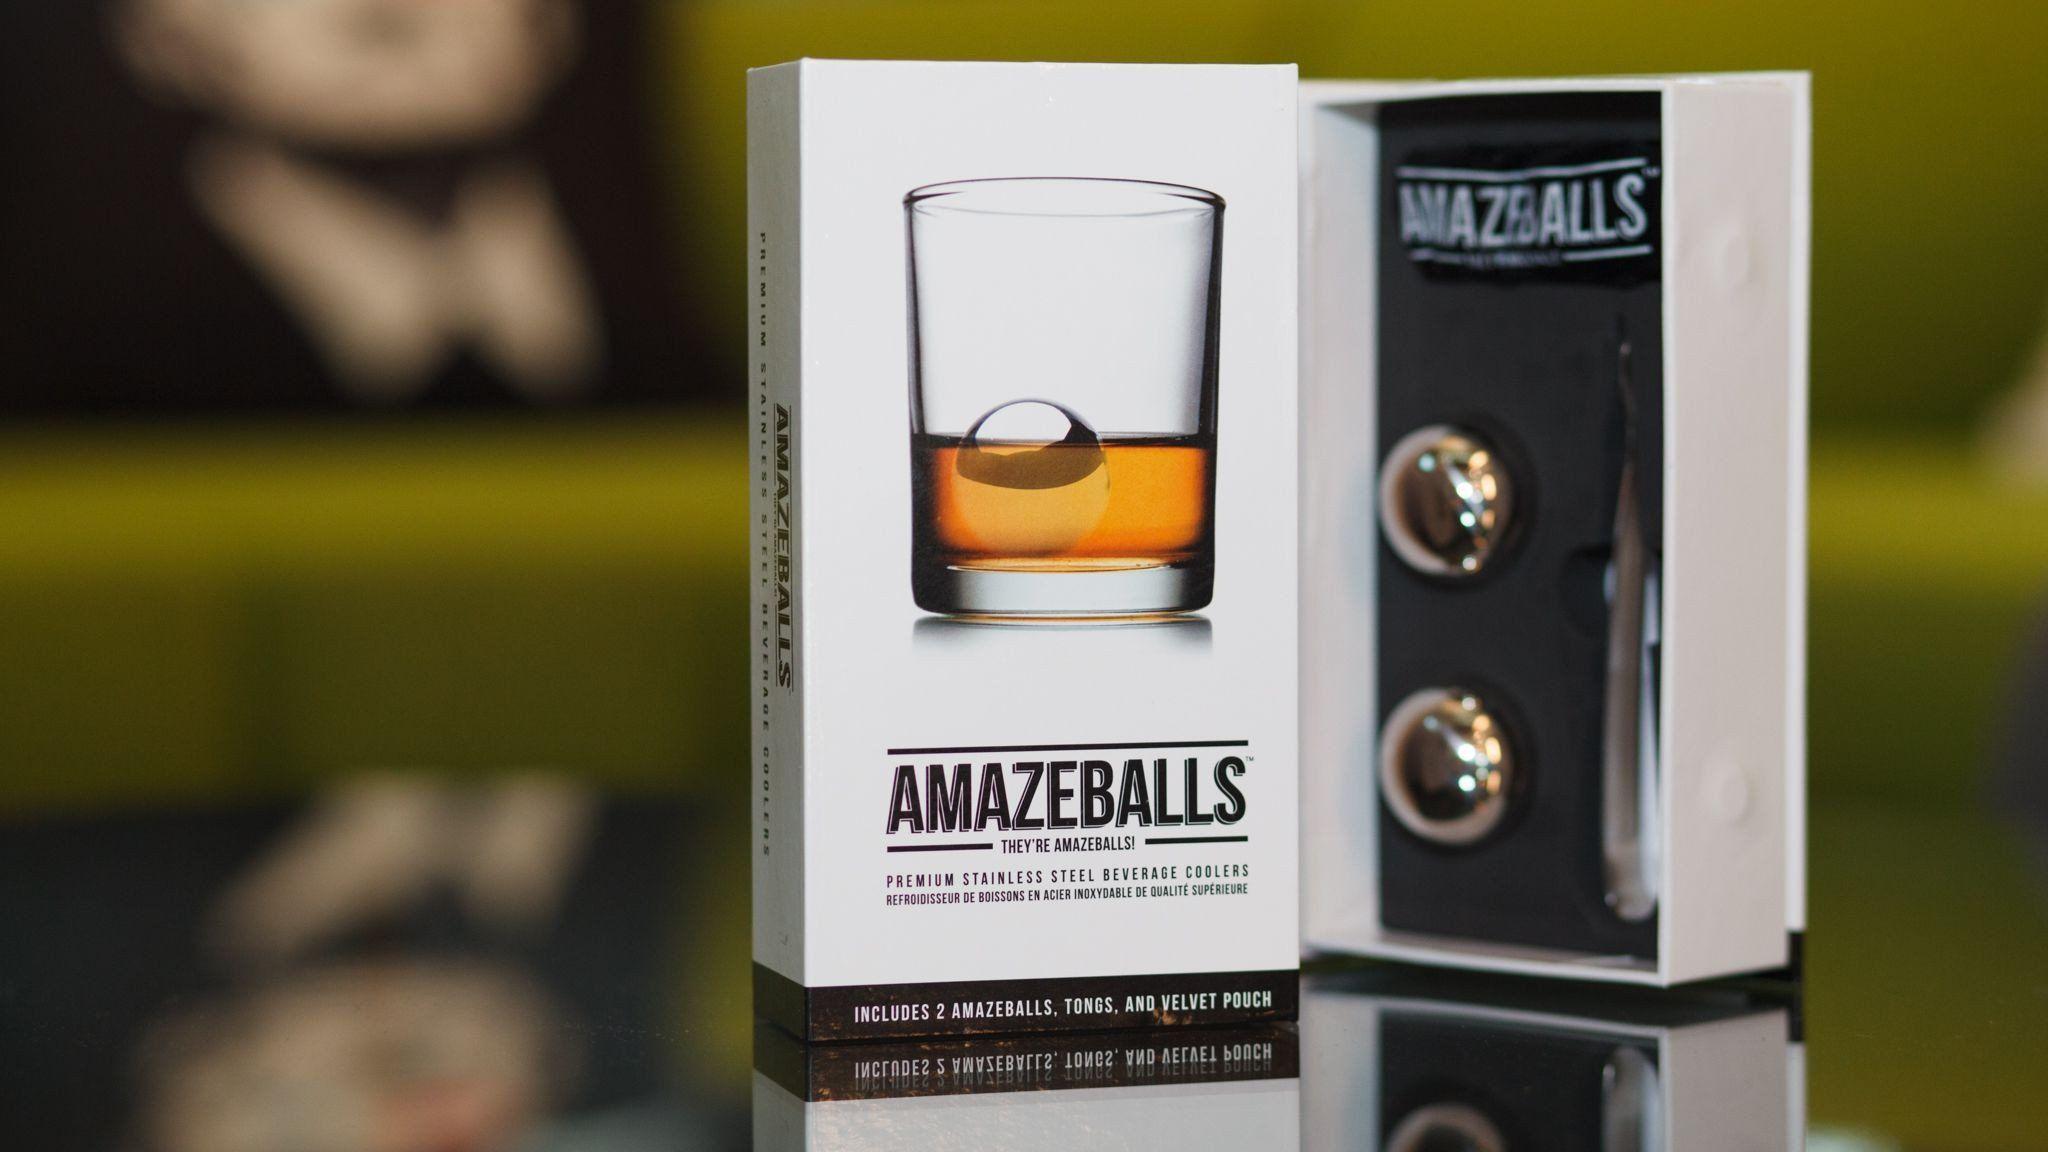 oficjalna strona delikatne kolory oferować rabaty Whiskey Balls - by Amazeballs | Cool inventions, Whiskey ...